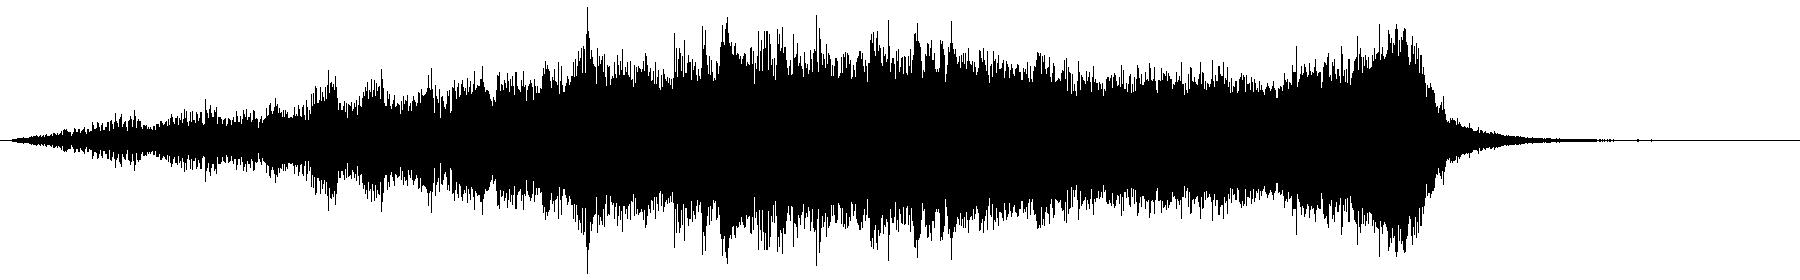 str fx b 03 xc